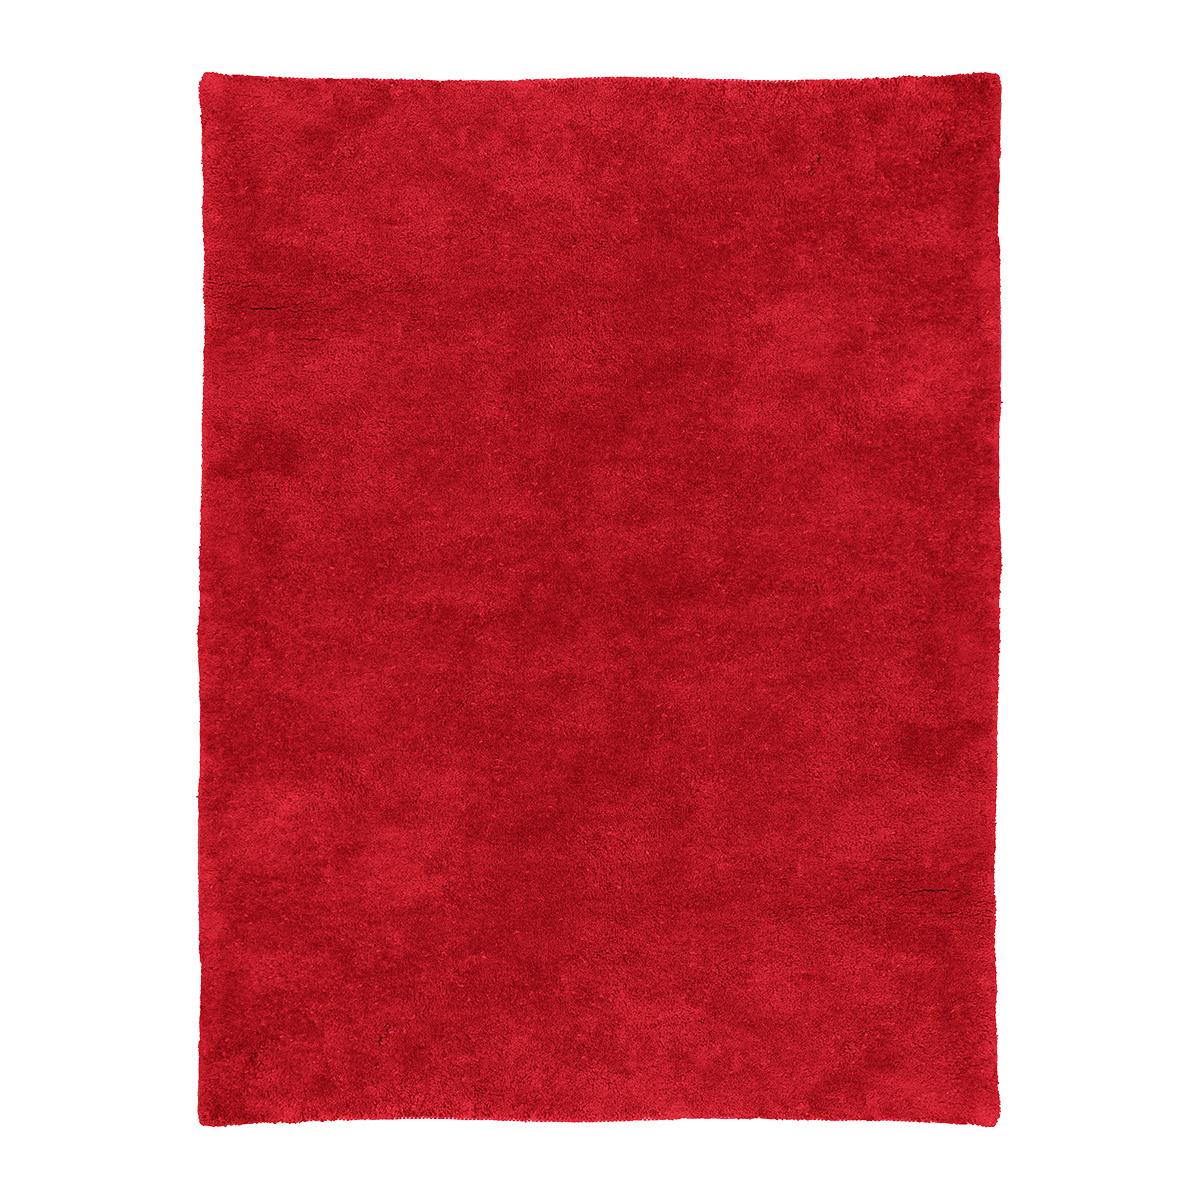 Tapis Velluto rouge 200 x 300